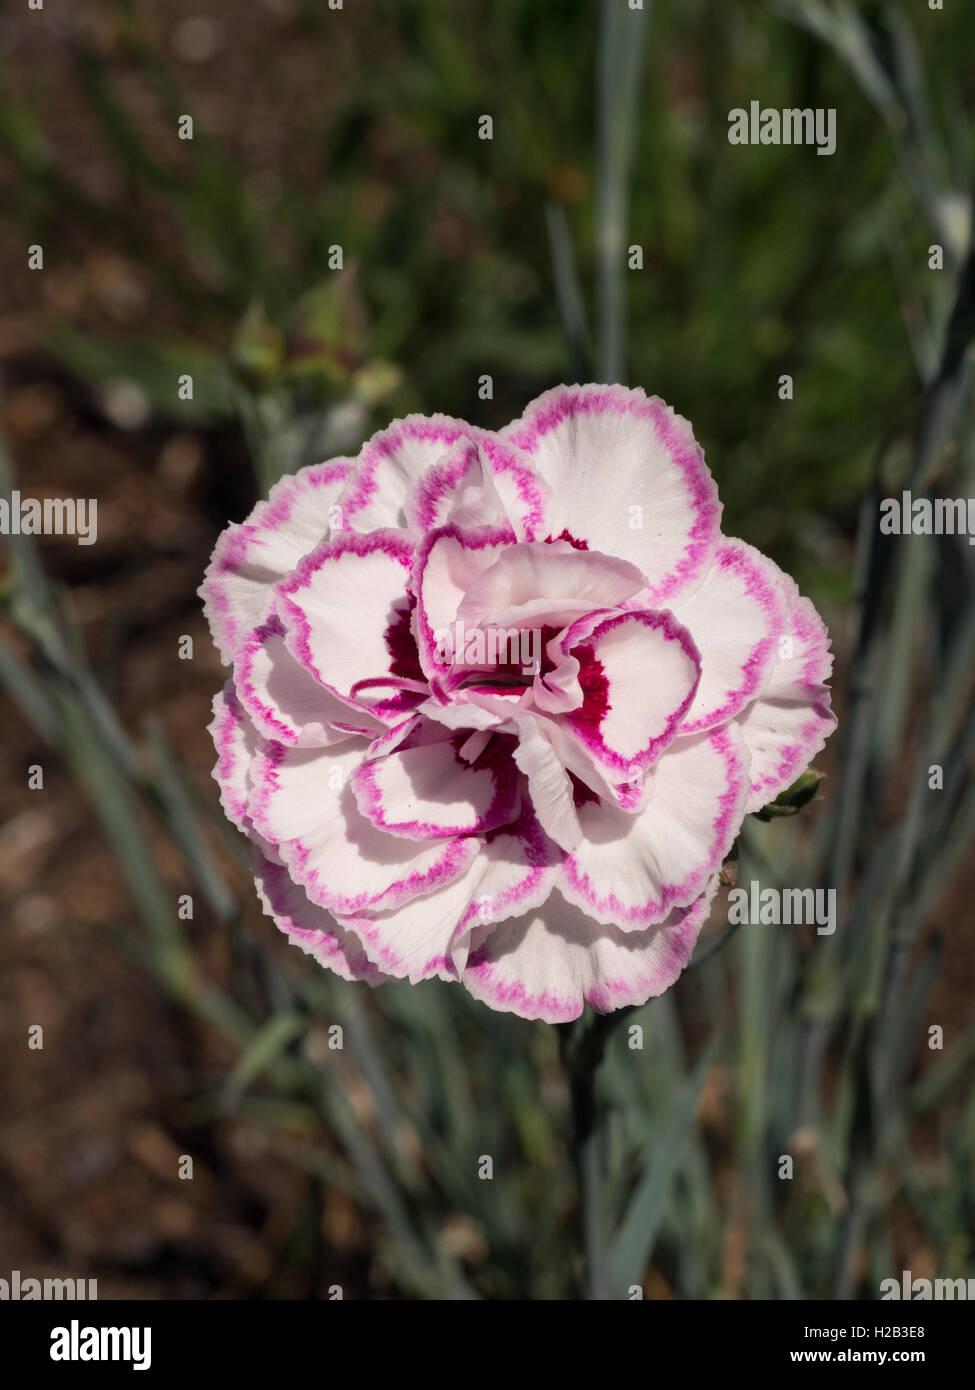 Dianthus 'Grans Favourite' flower - Stock Image